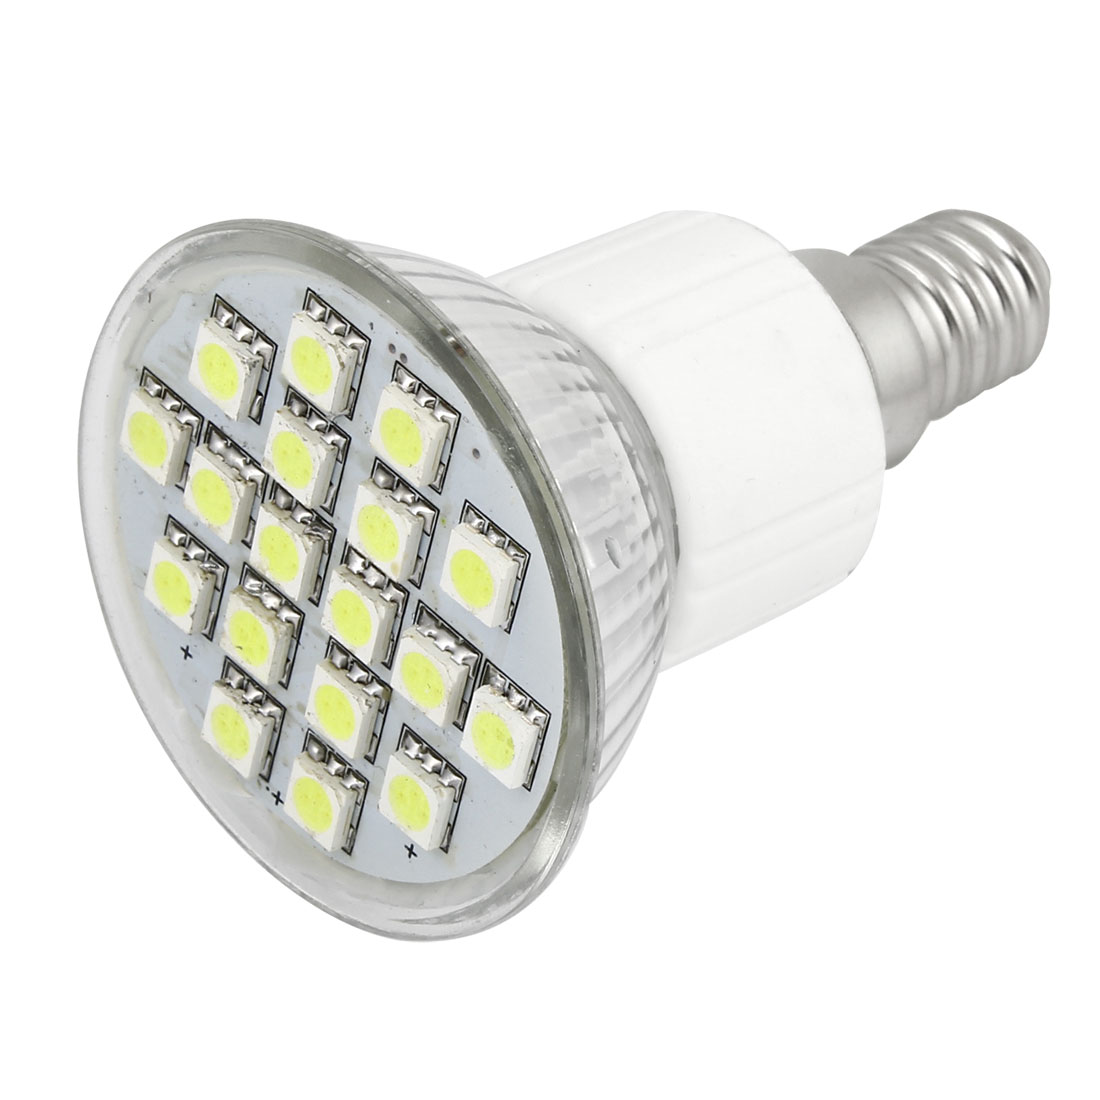 AC 110V E14 Base 18 5050 SMD 6W White LED Down Light Spotlight Bulb